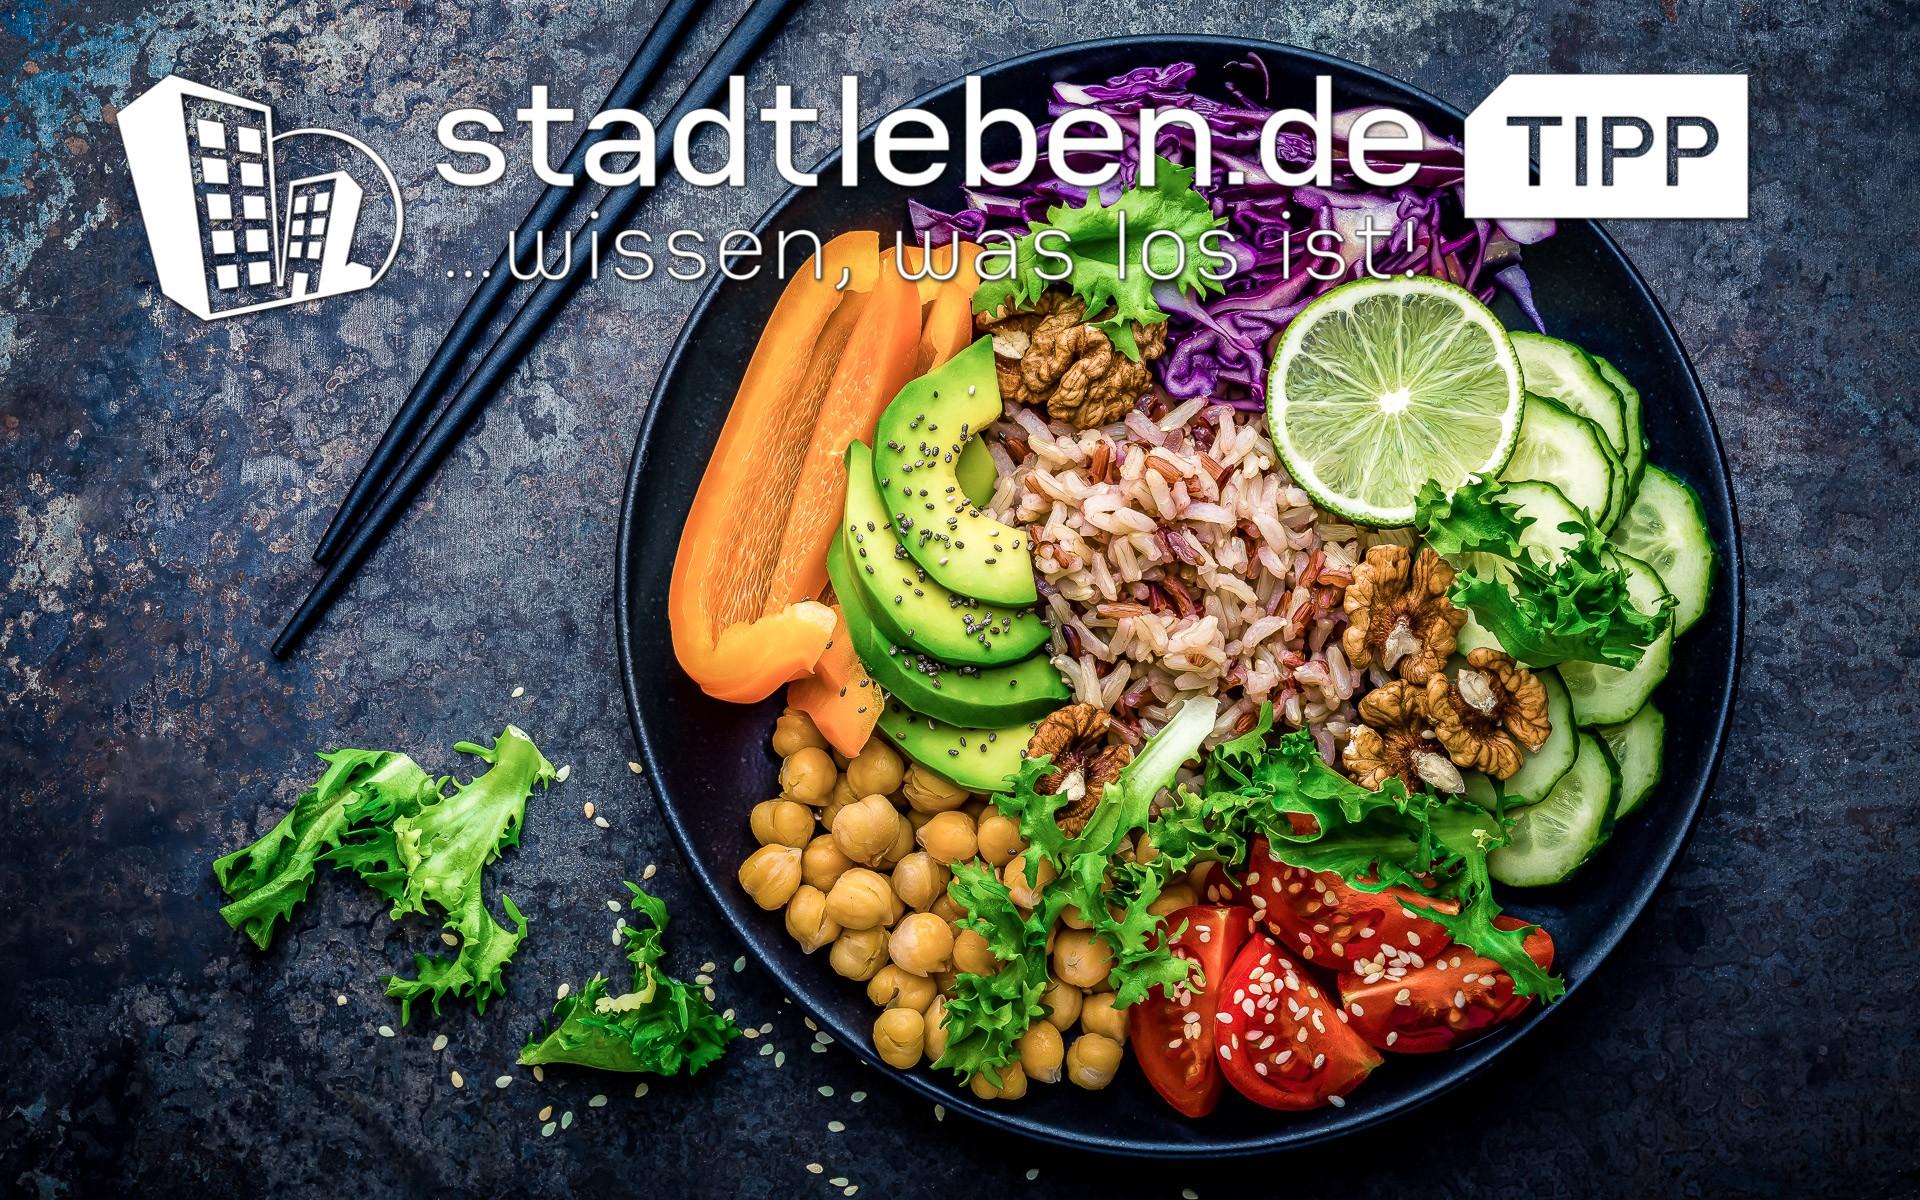 Avocado, Tomate, Limette, Gurke, Reis, Paprika, Wallnüsse, Bowl